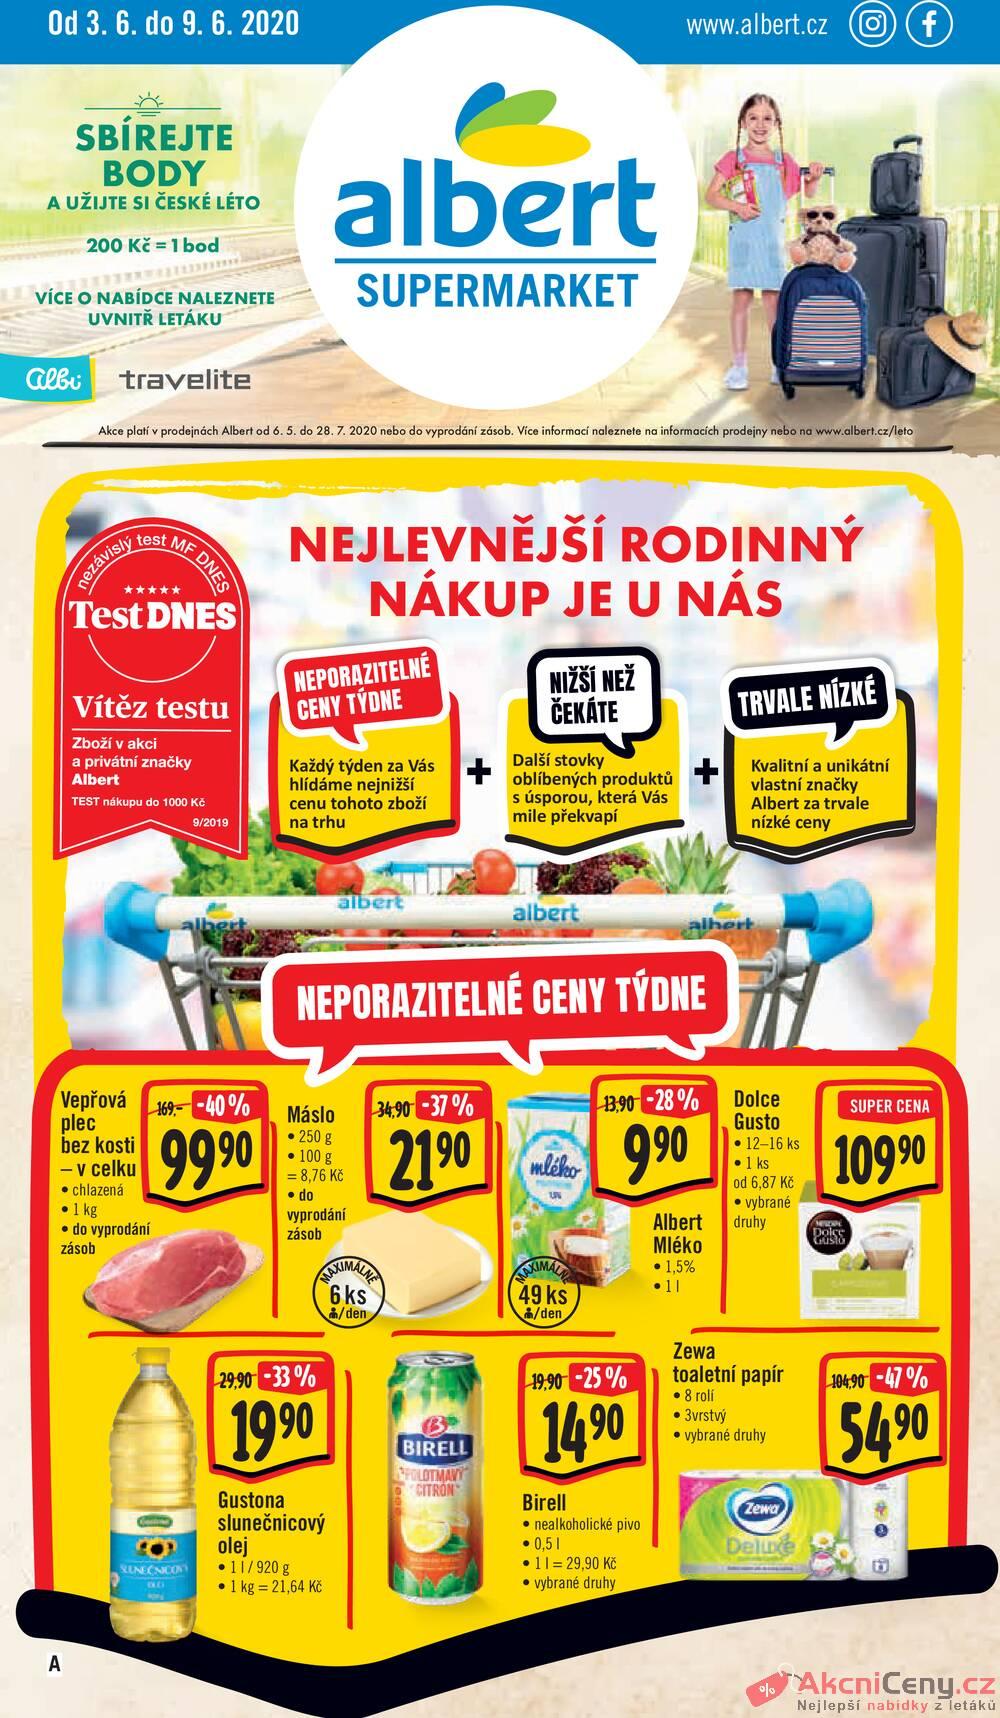 Albert Supermarket od 3.6. do 9.6.2020